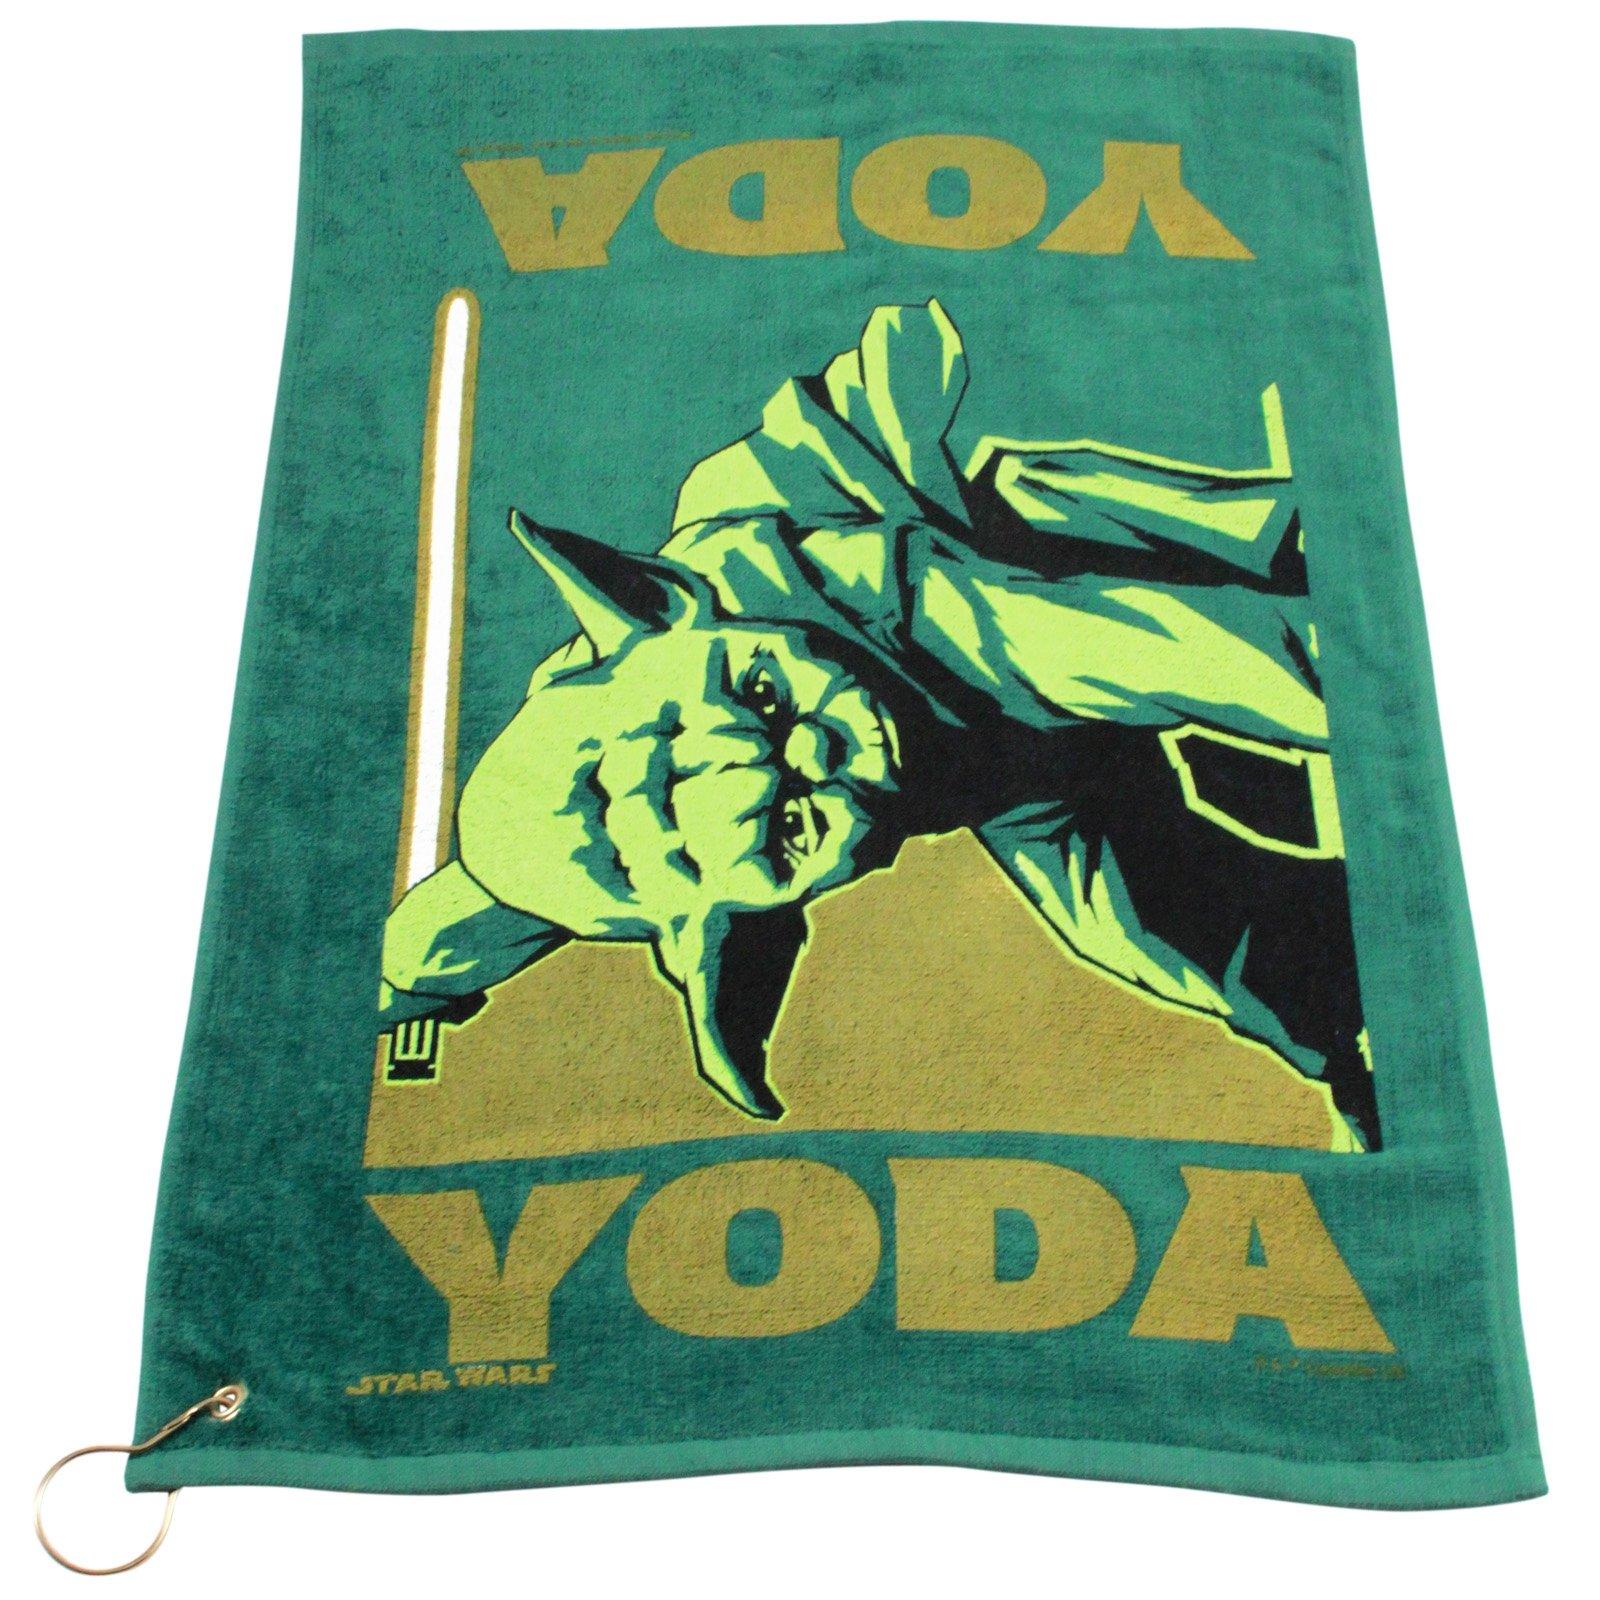 Star Wars Yoda Green Golf Towel with Corner Grommet